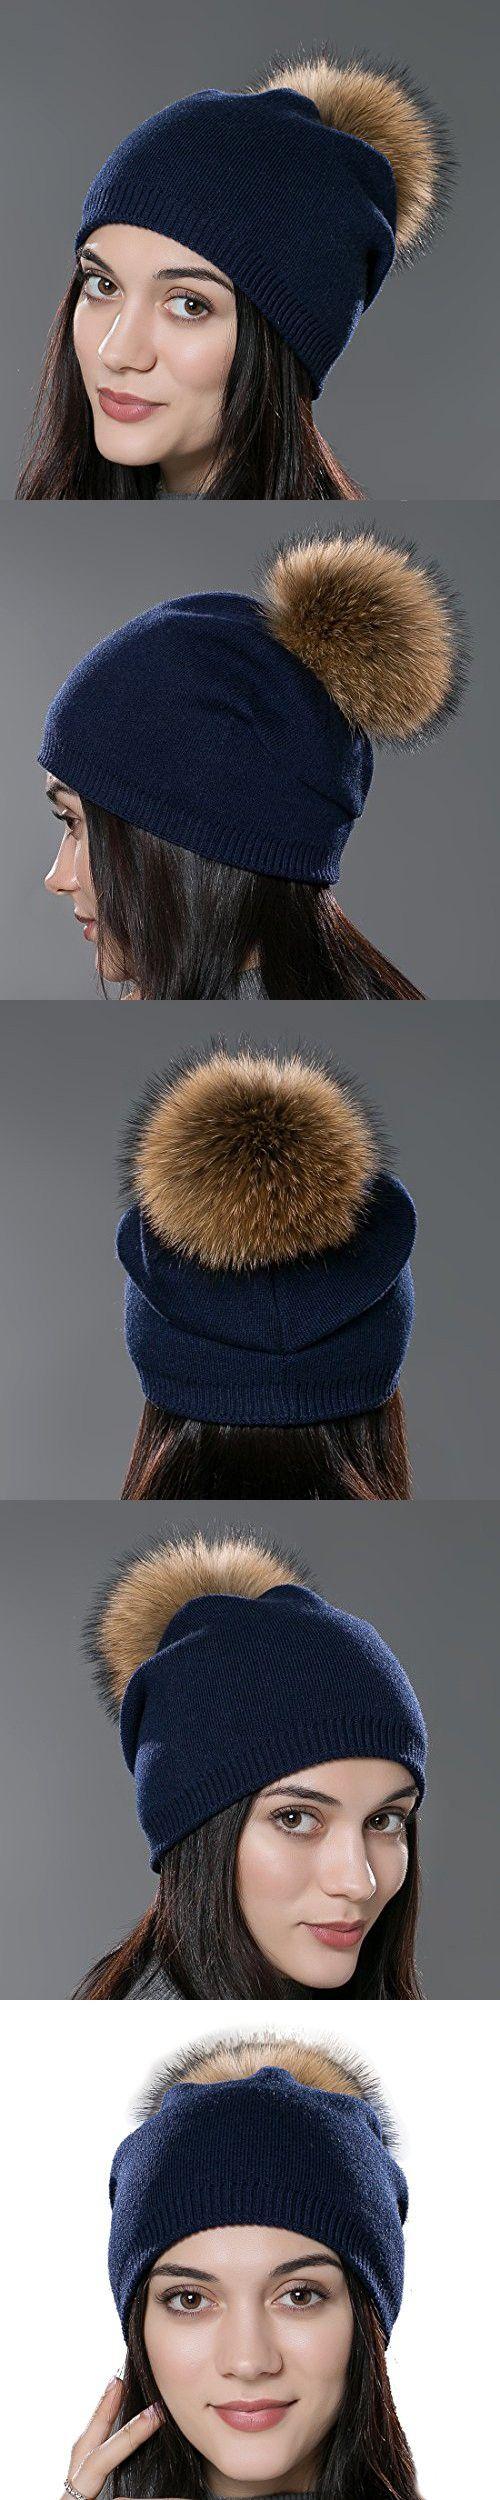 2030d3c5e7466 URSFUR Autumn Unisex Wool Knit Beanie Cap with Fur Ball Pom Pom Winter Hat